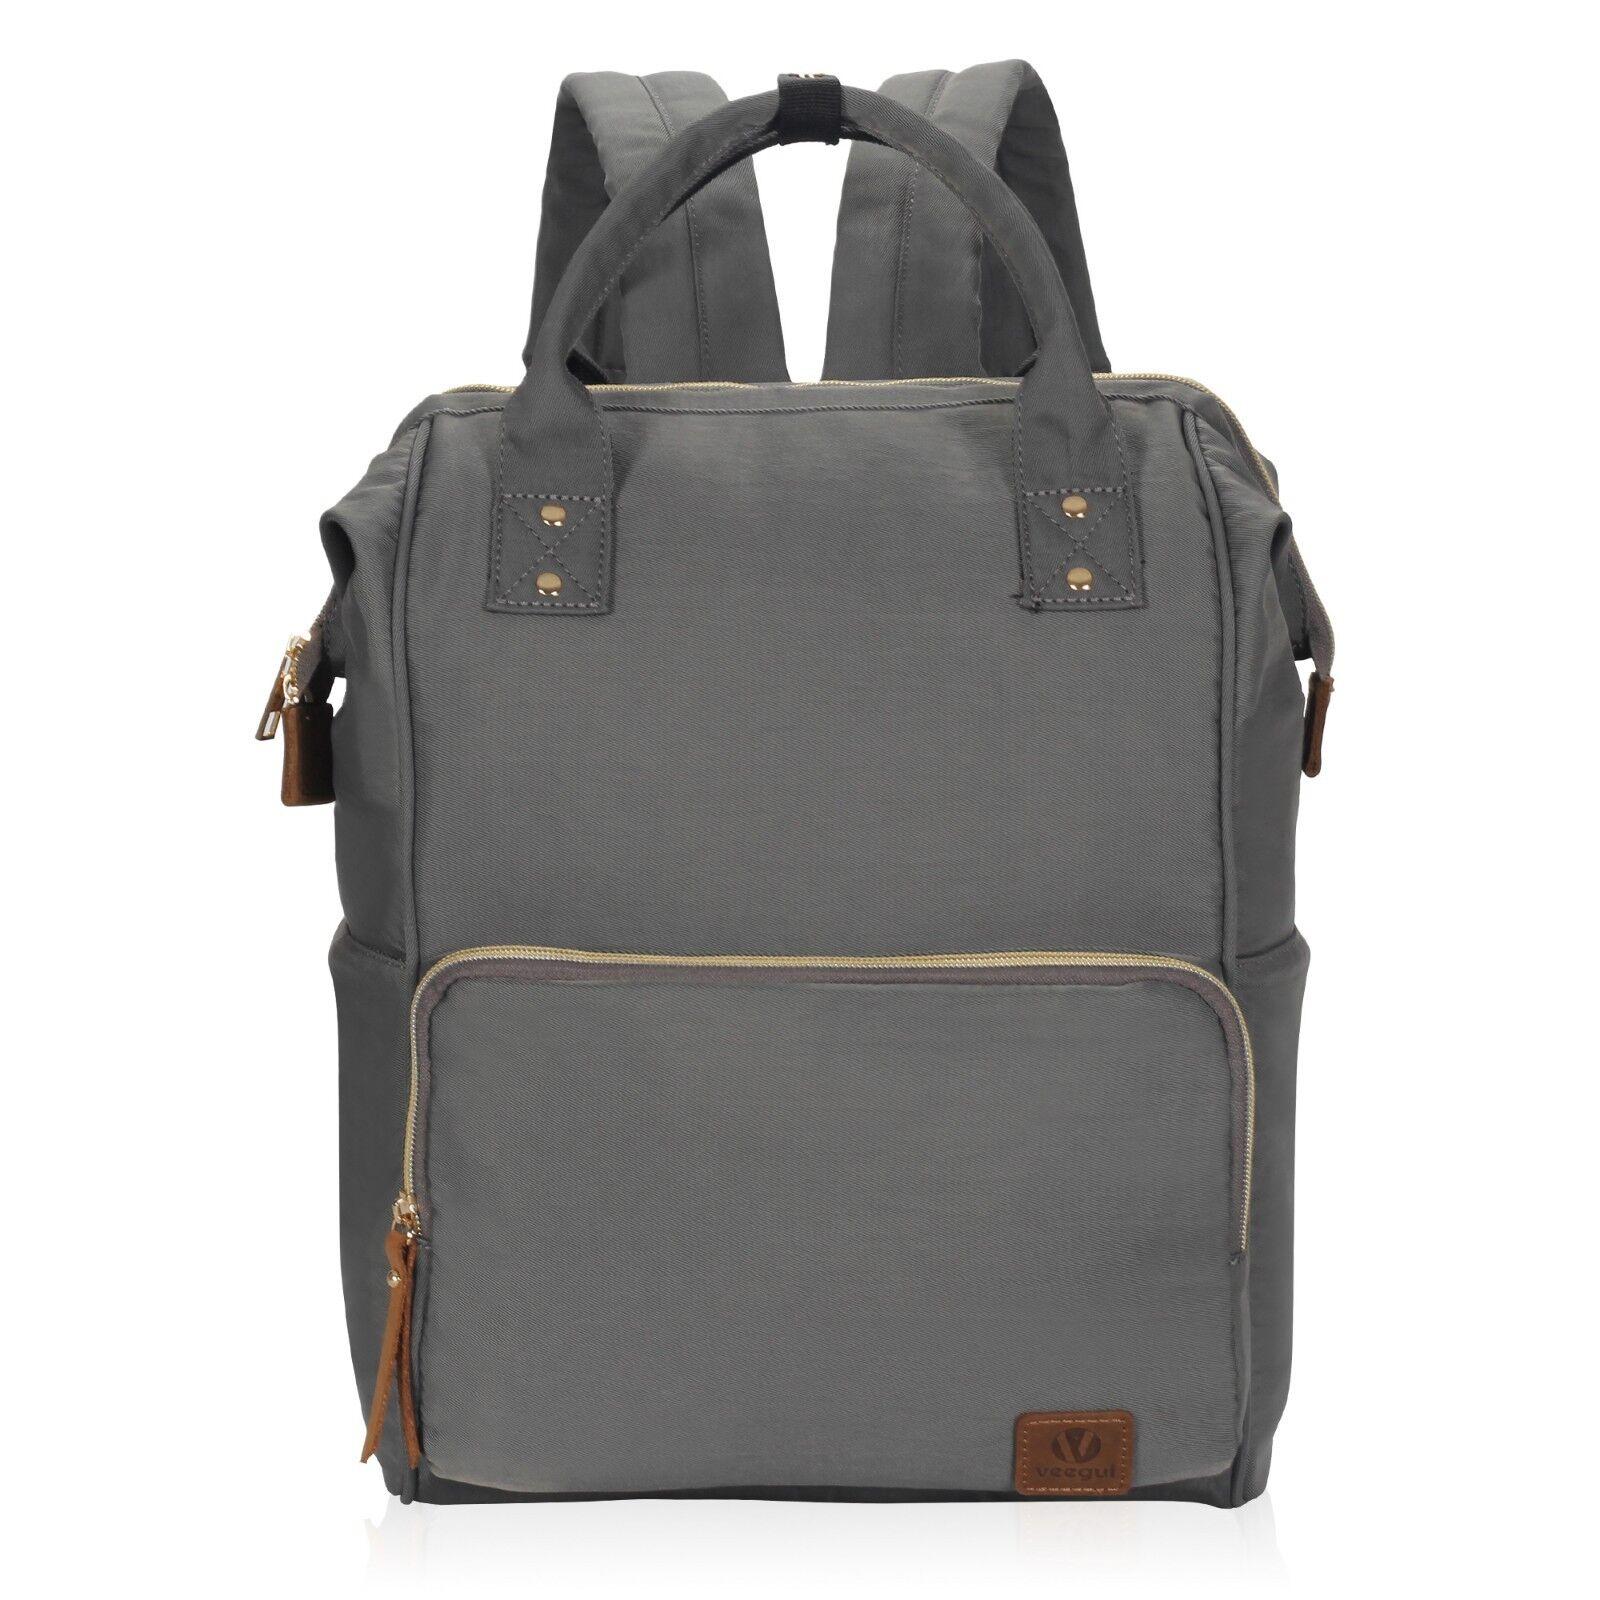 VEEGUL Nylon Backpack for Women Convertible Handbag Stylish